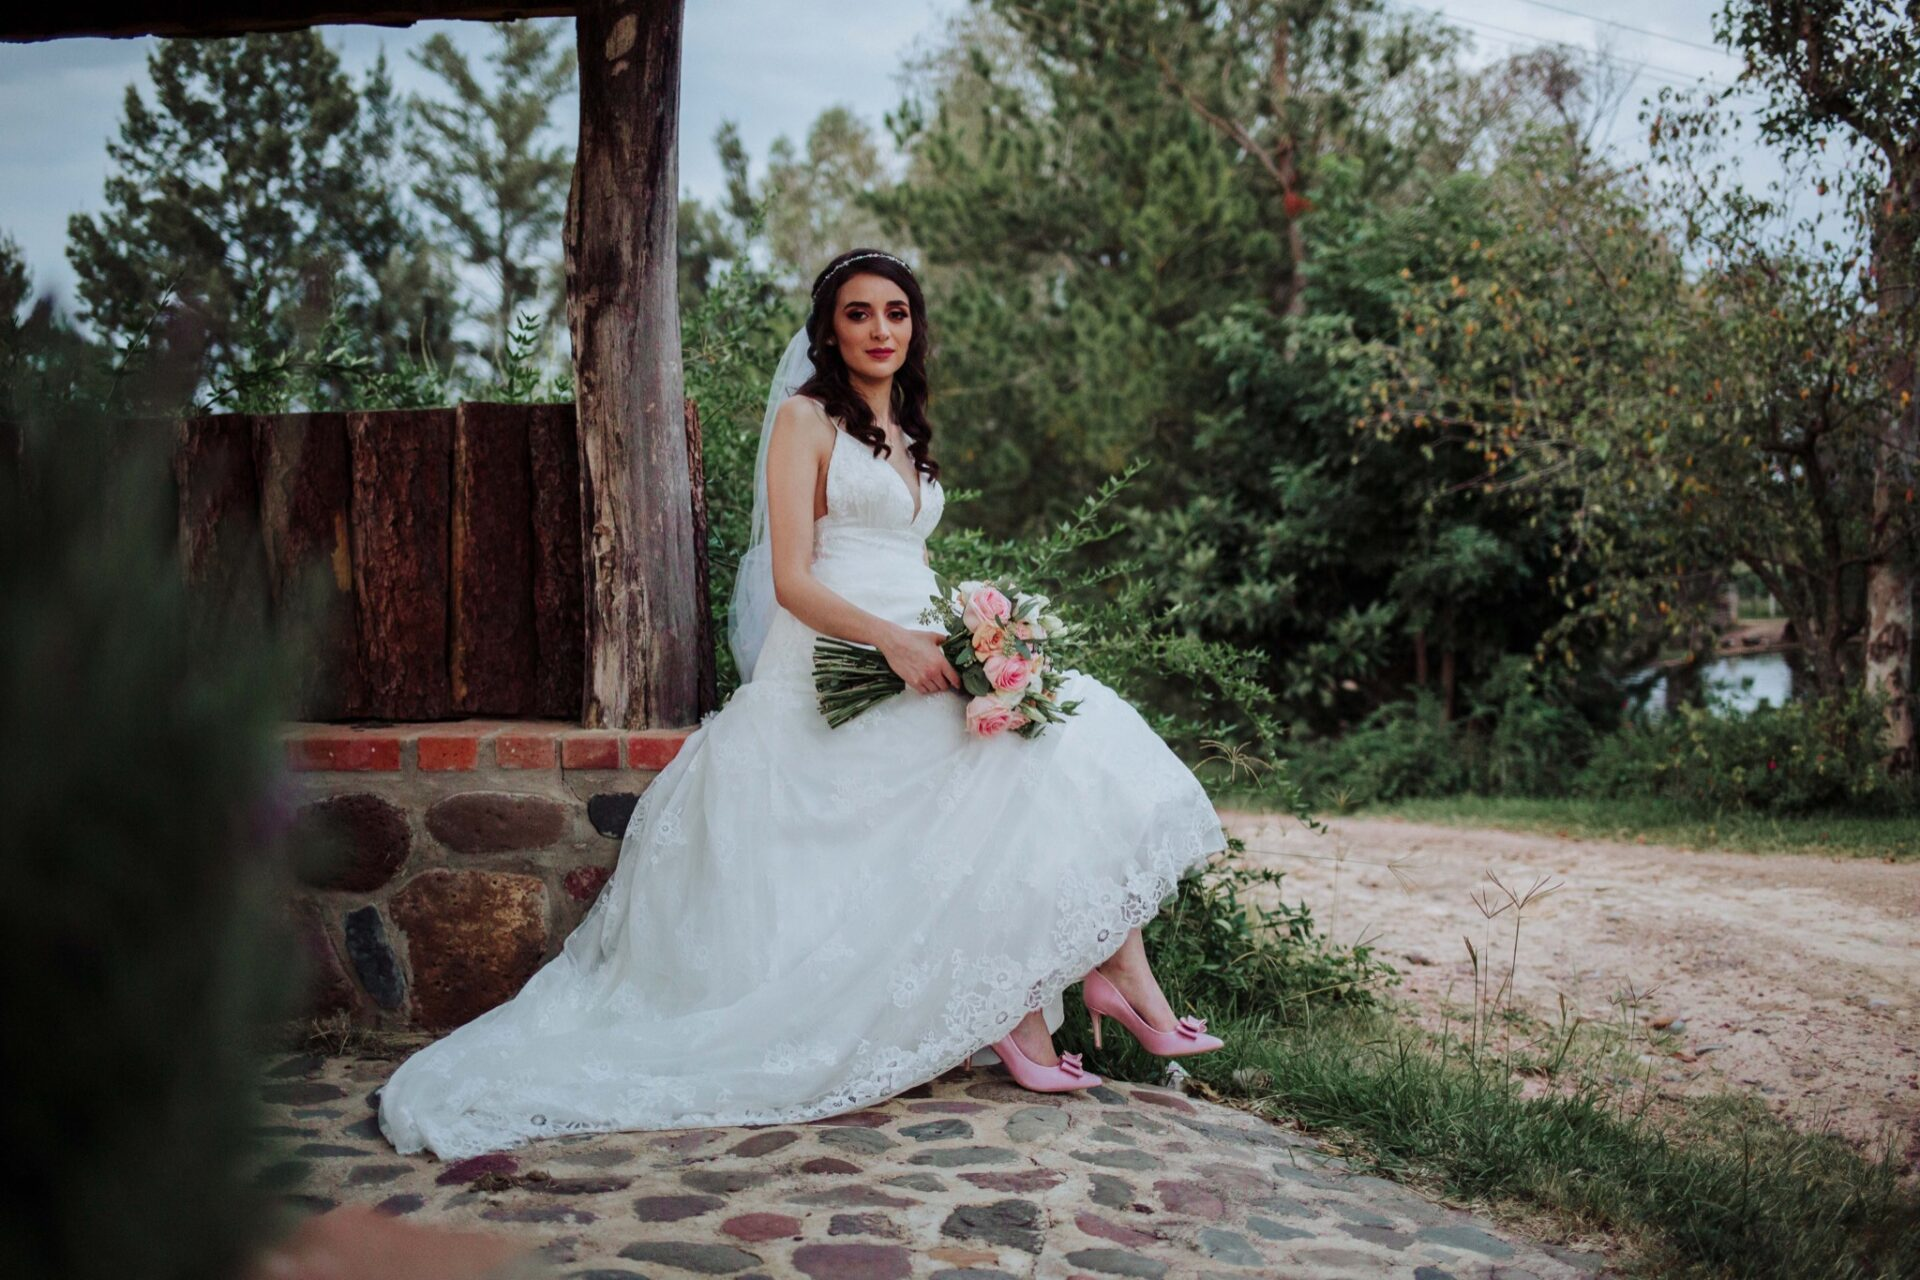 javier_noriega_fotografo_bodas_teul_zacatecas_wedding_photographer30